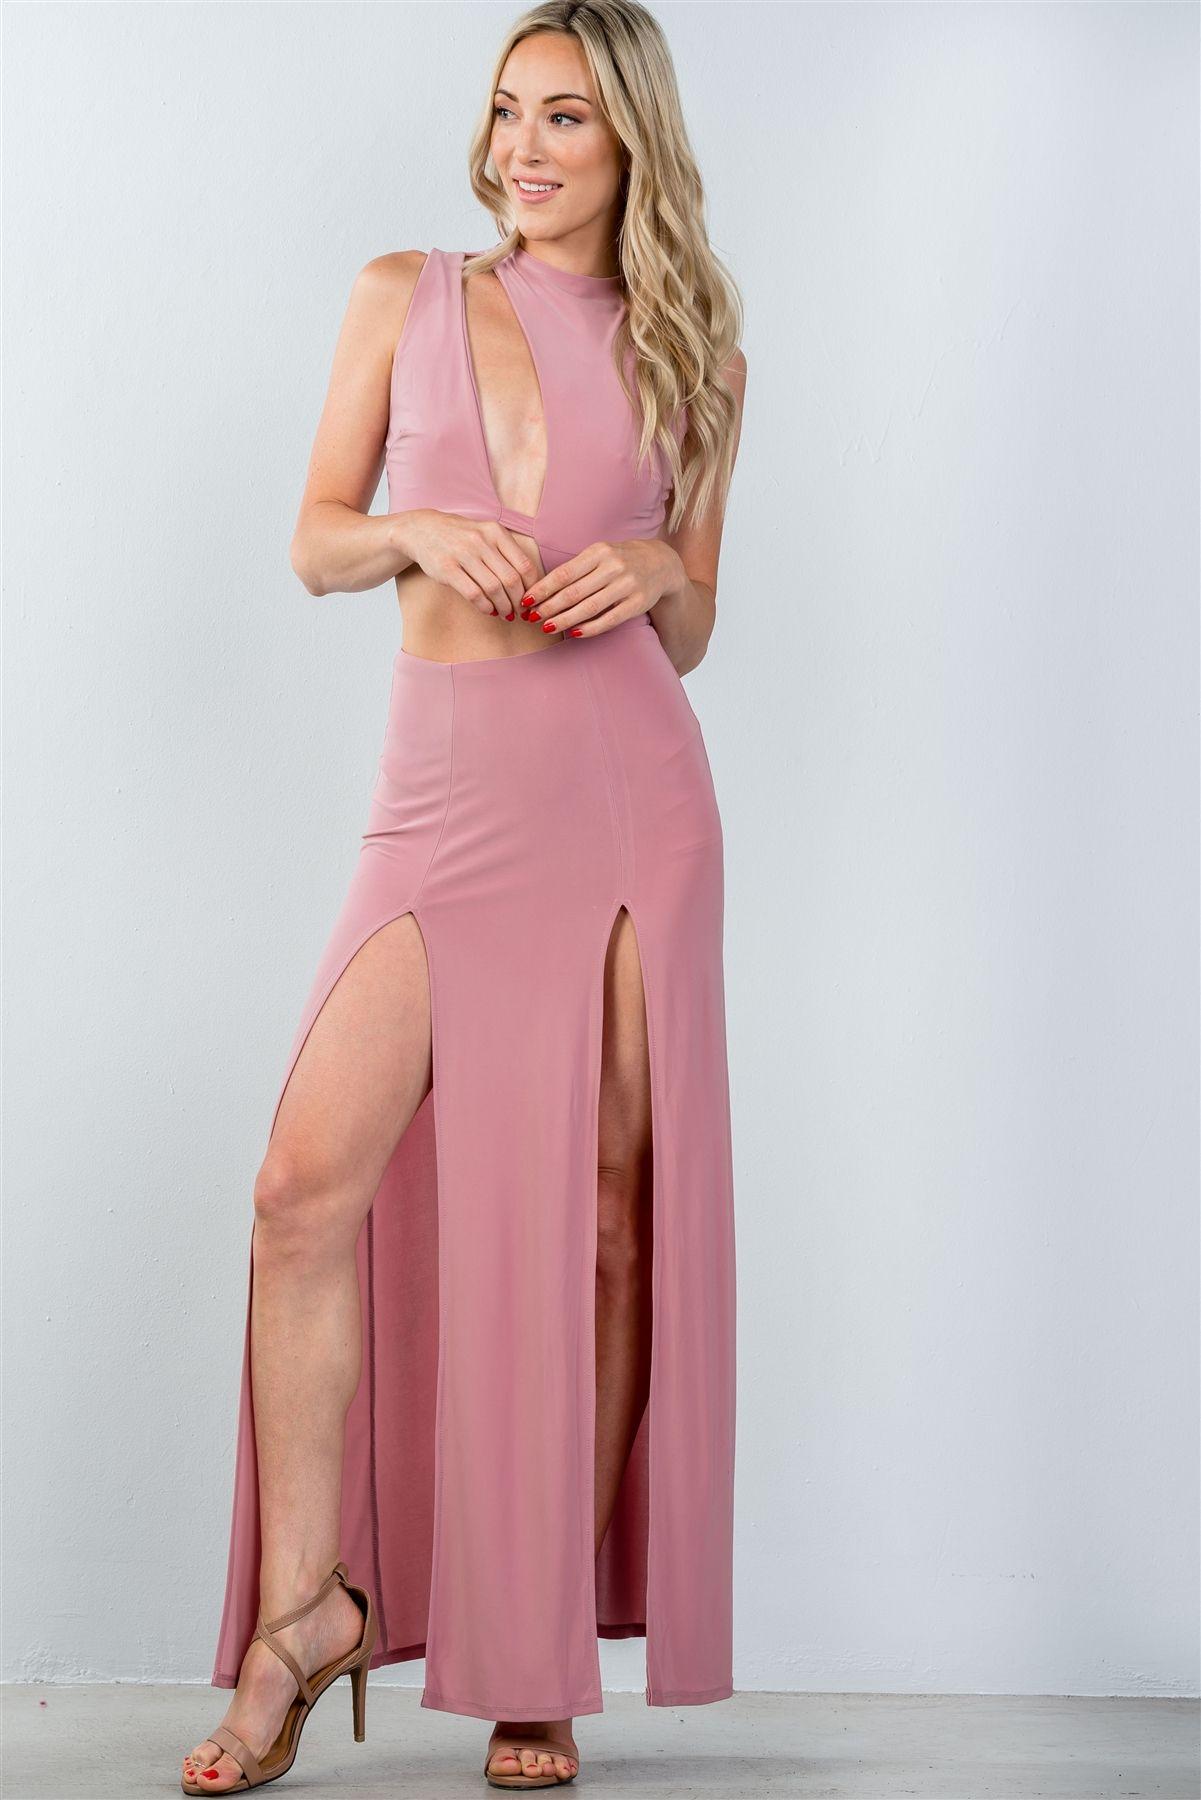 Ladies fashion cut out double thigh high slit maxi dress